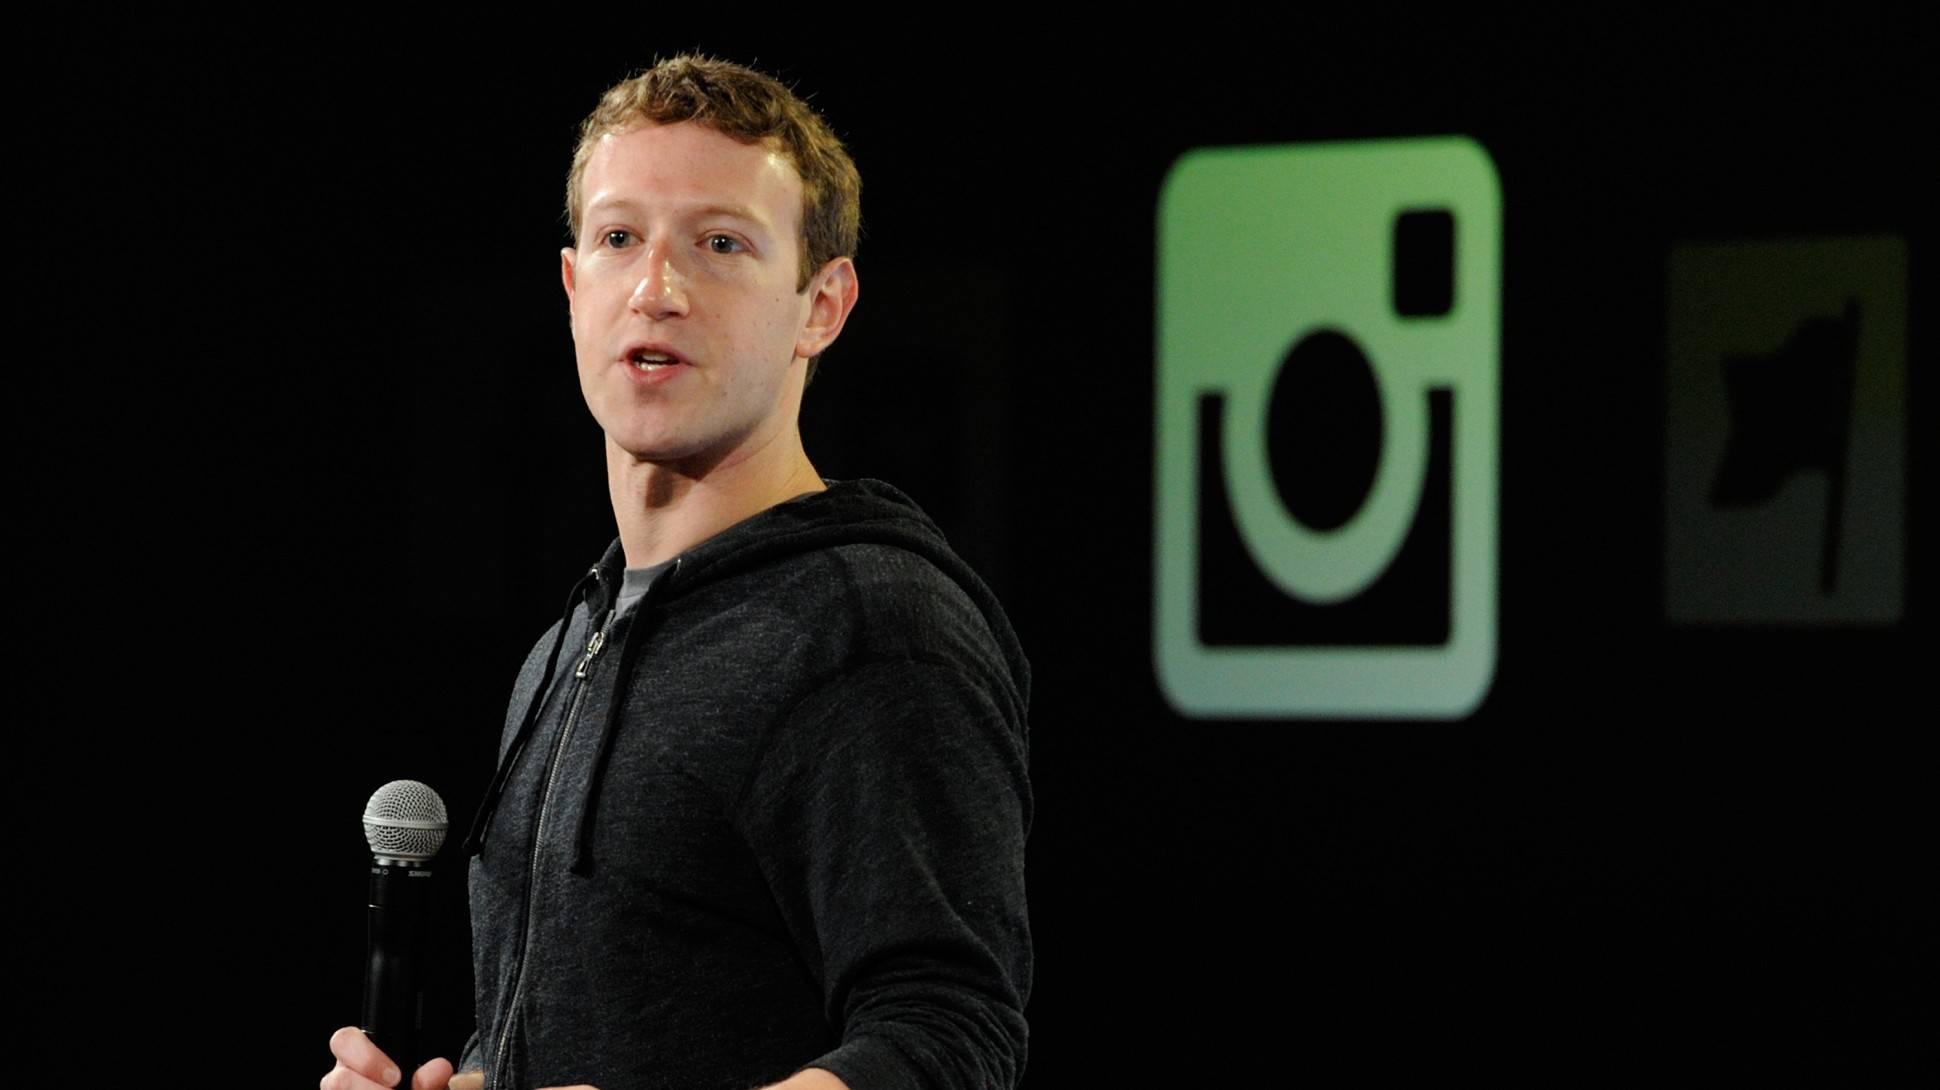 Zuckerberg-Instagram1-e1419003169449-1940x1090